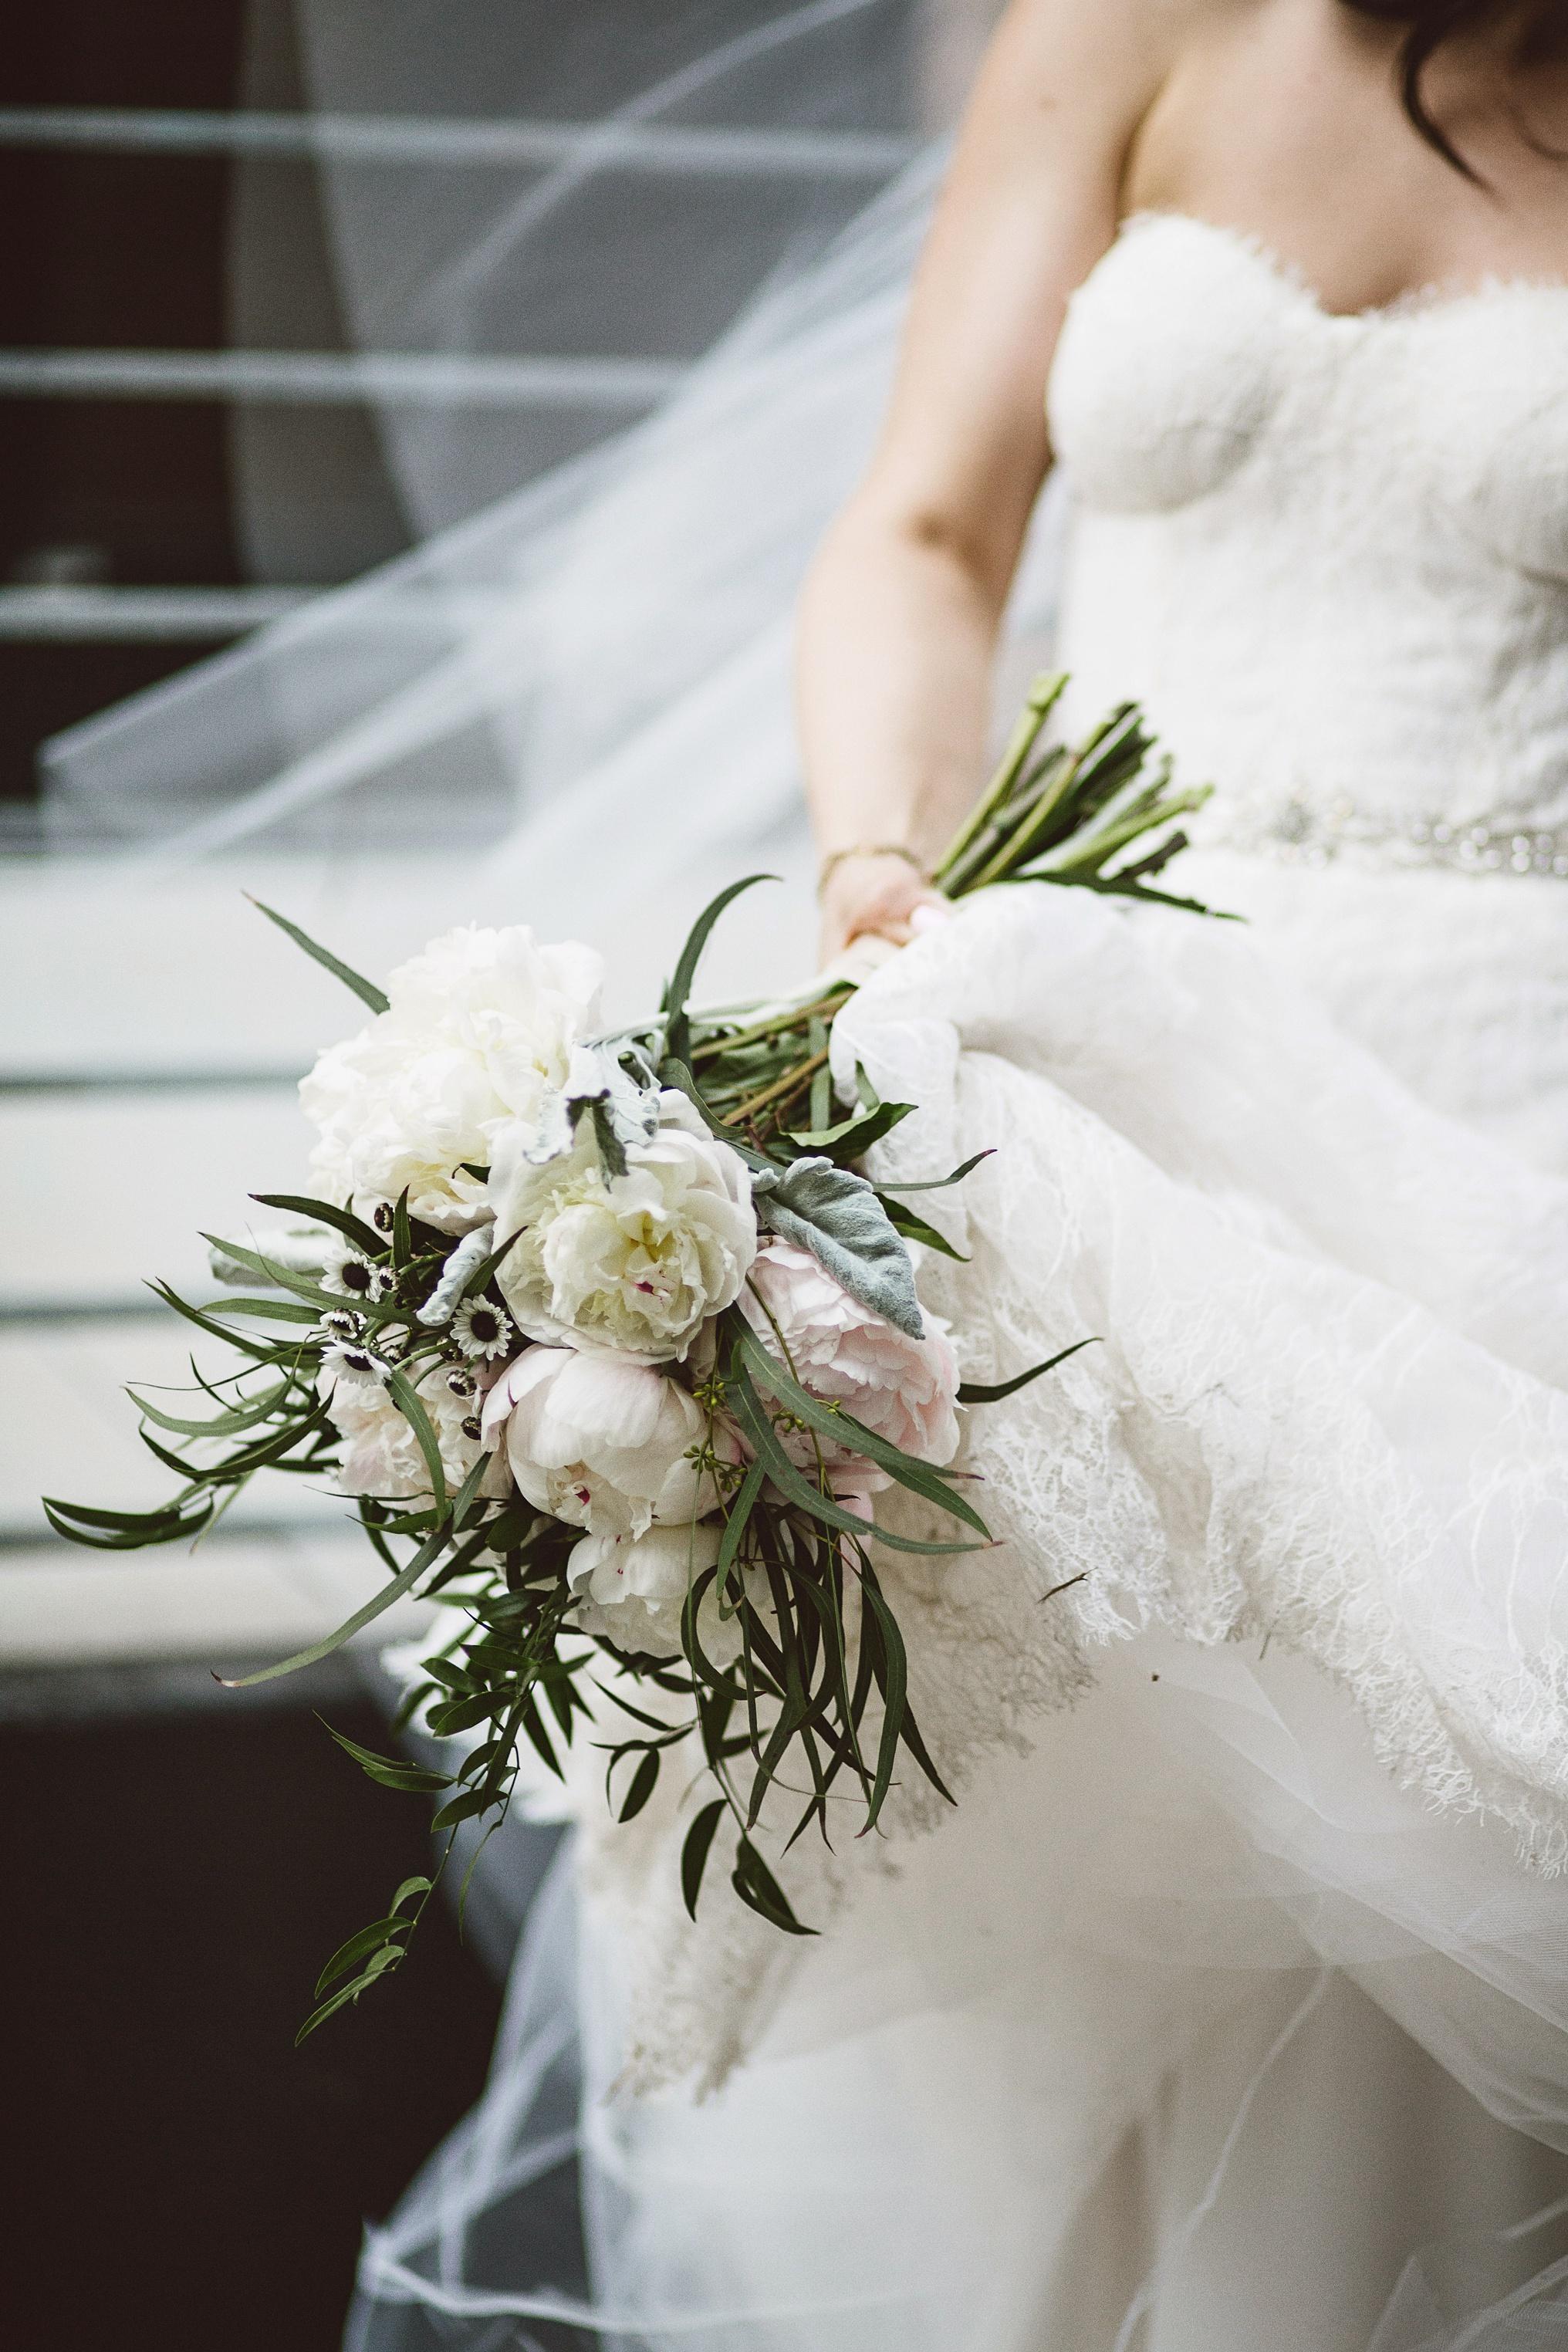 best_wedding_photography_2017_by_lucas_botz_photography_192.jpg